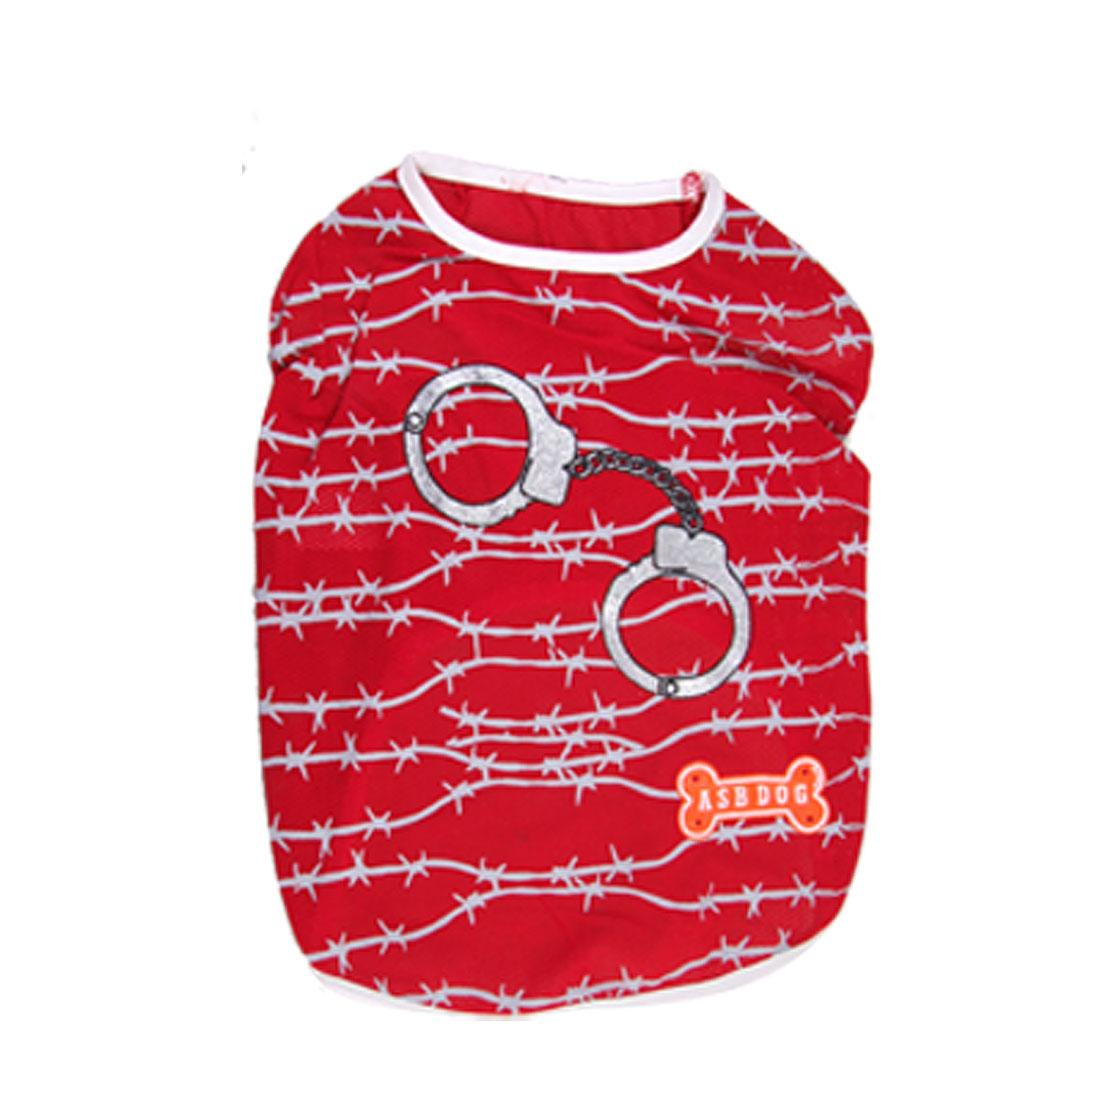 Size XXL Round Neck Striped Summer Pet Puppy Dog Apparel Shirt Vest Clothes Red